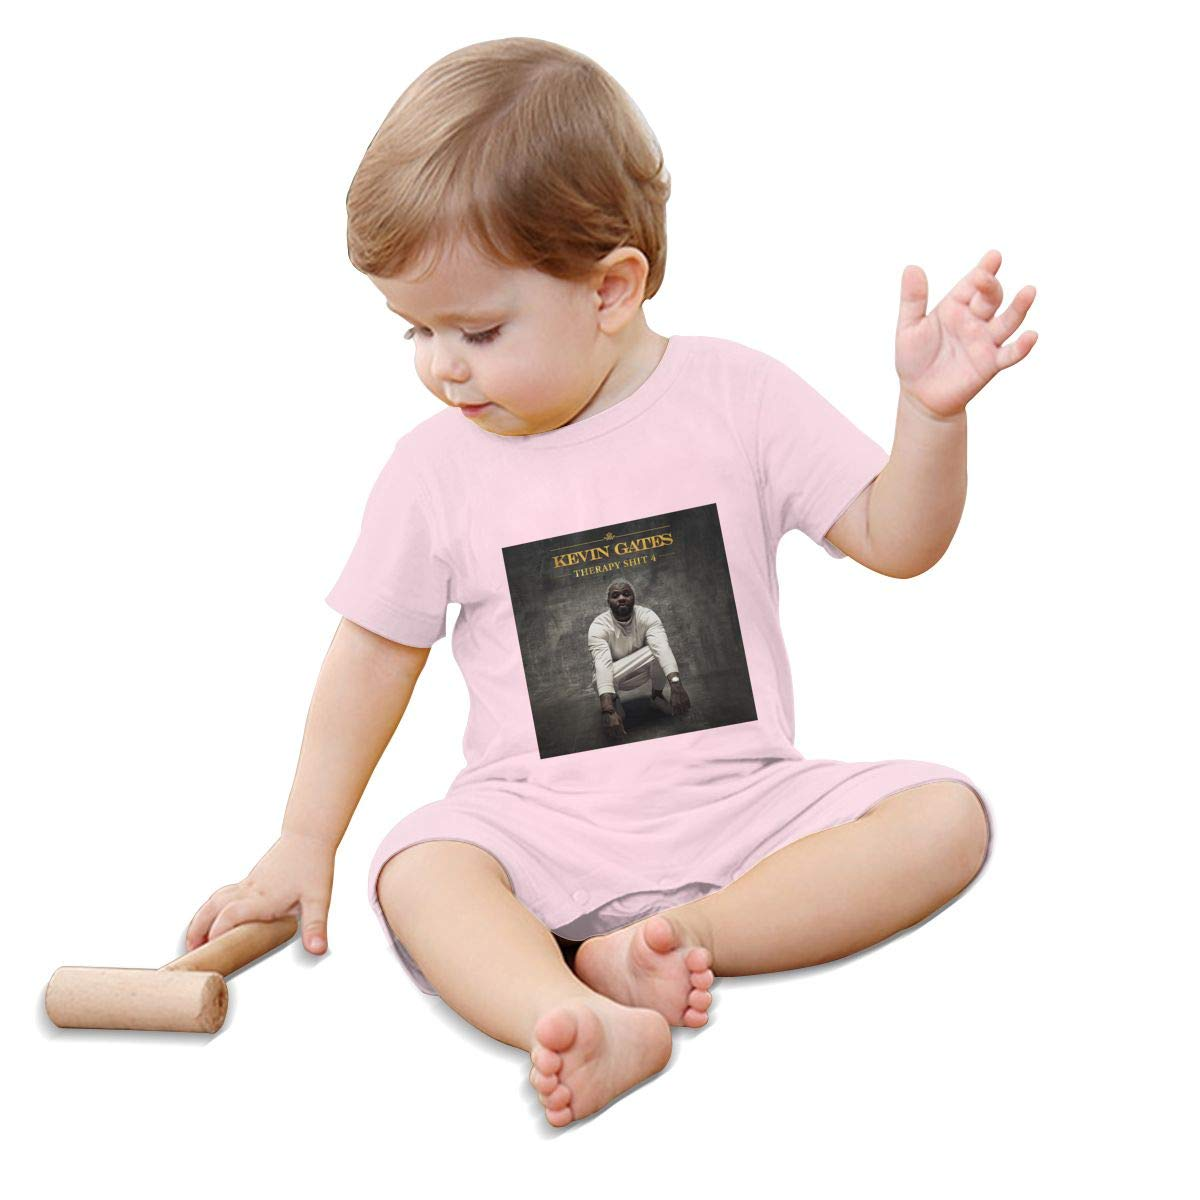 RhteGui Kevin Gates Rompers Solid Infant Short Sleeve Pajamas Unisex Cotton Summer for 0-24 Months